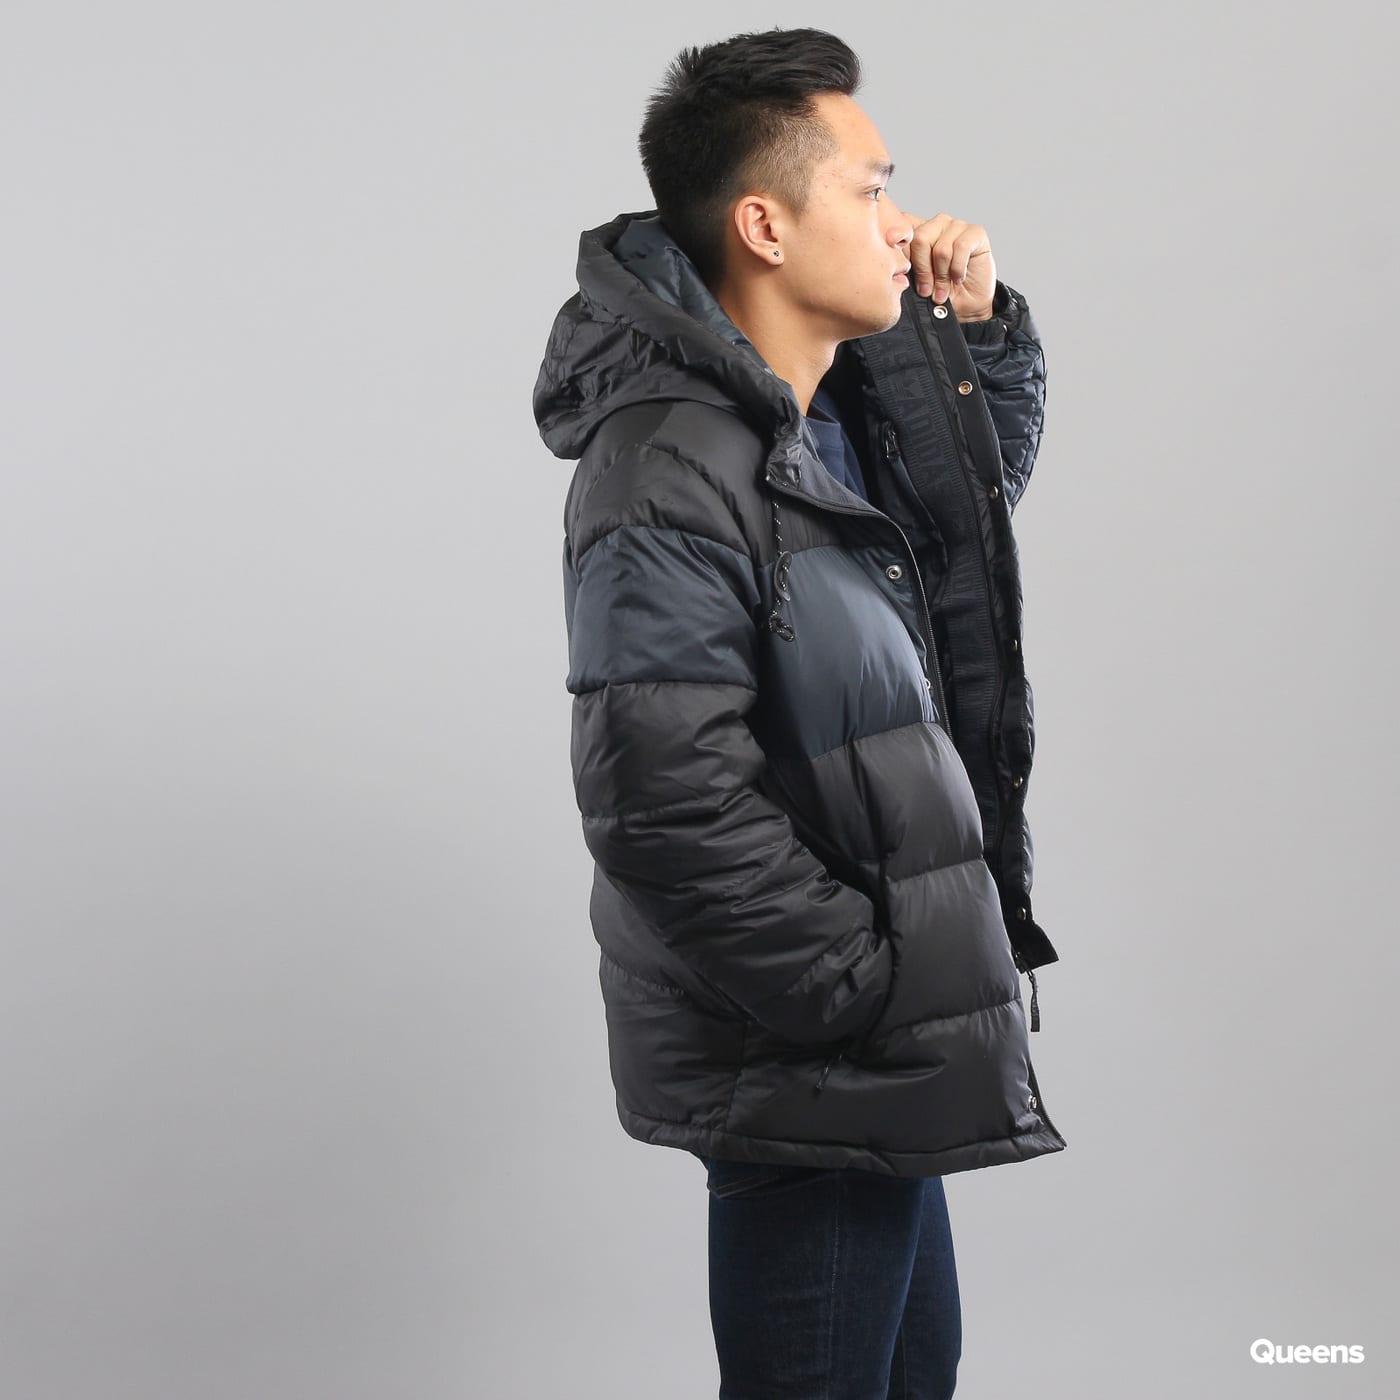 Id96 Adidas Originals Black Jacket Down dxBWCeQro